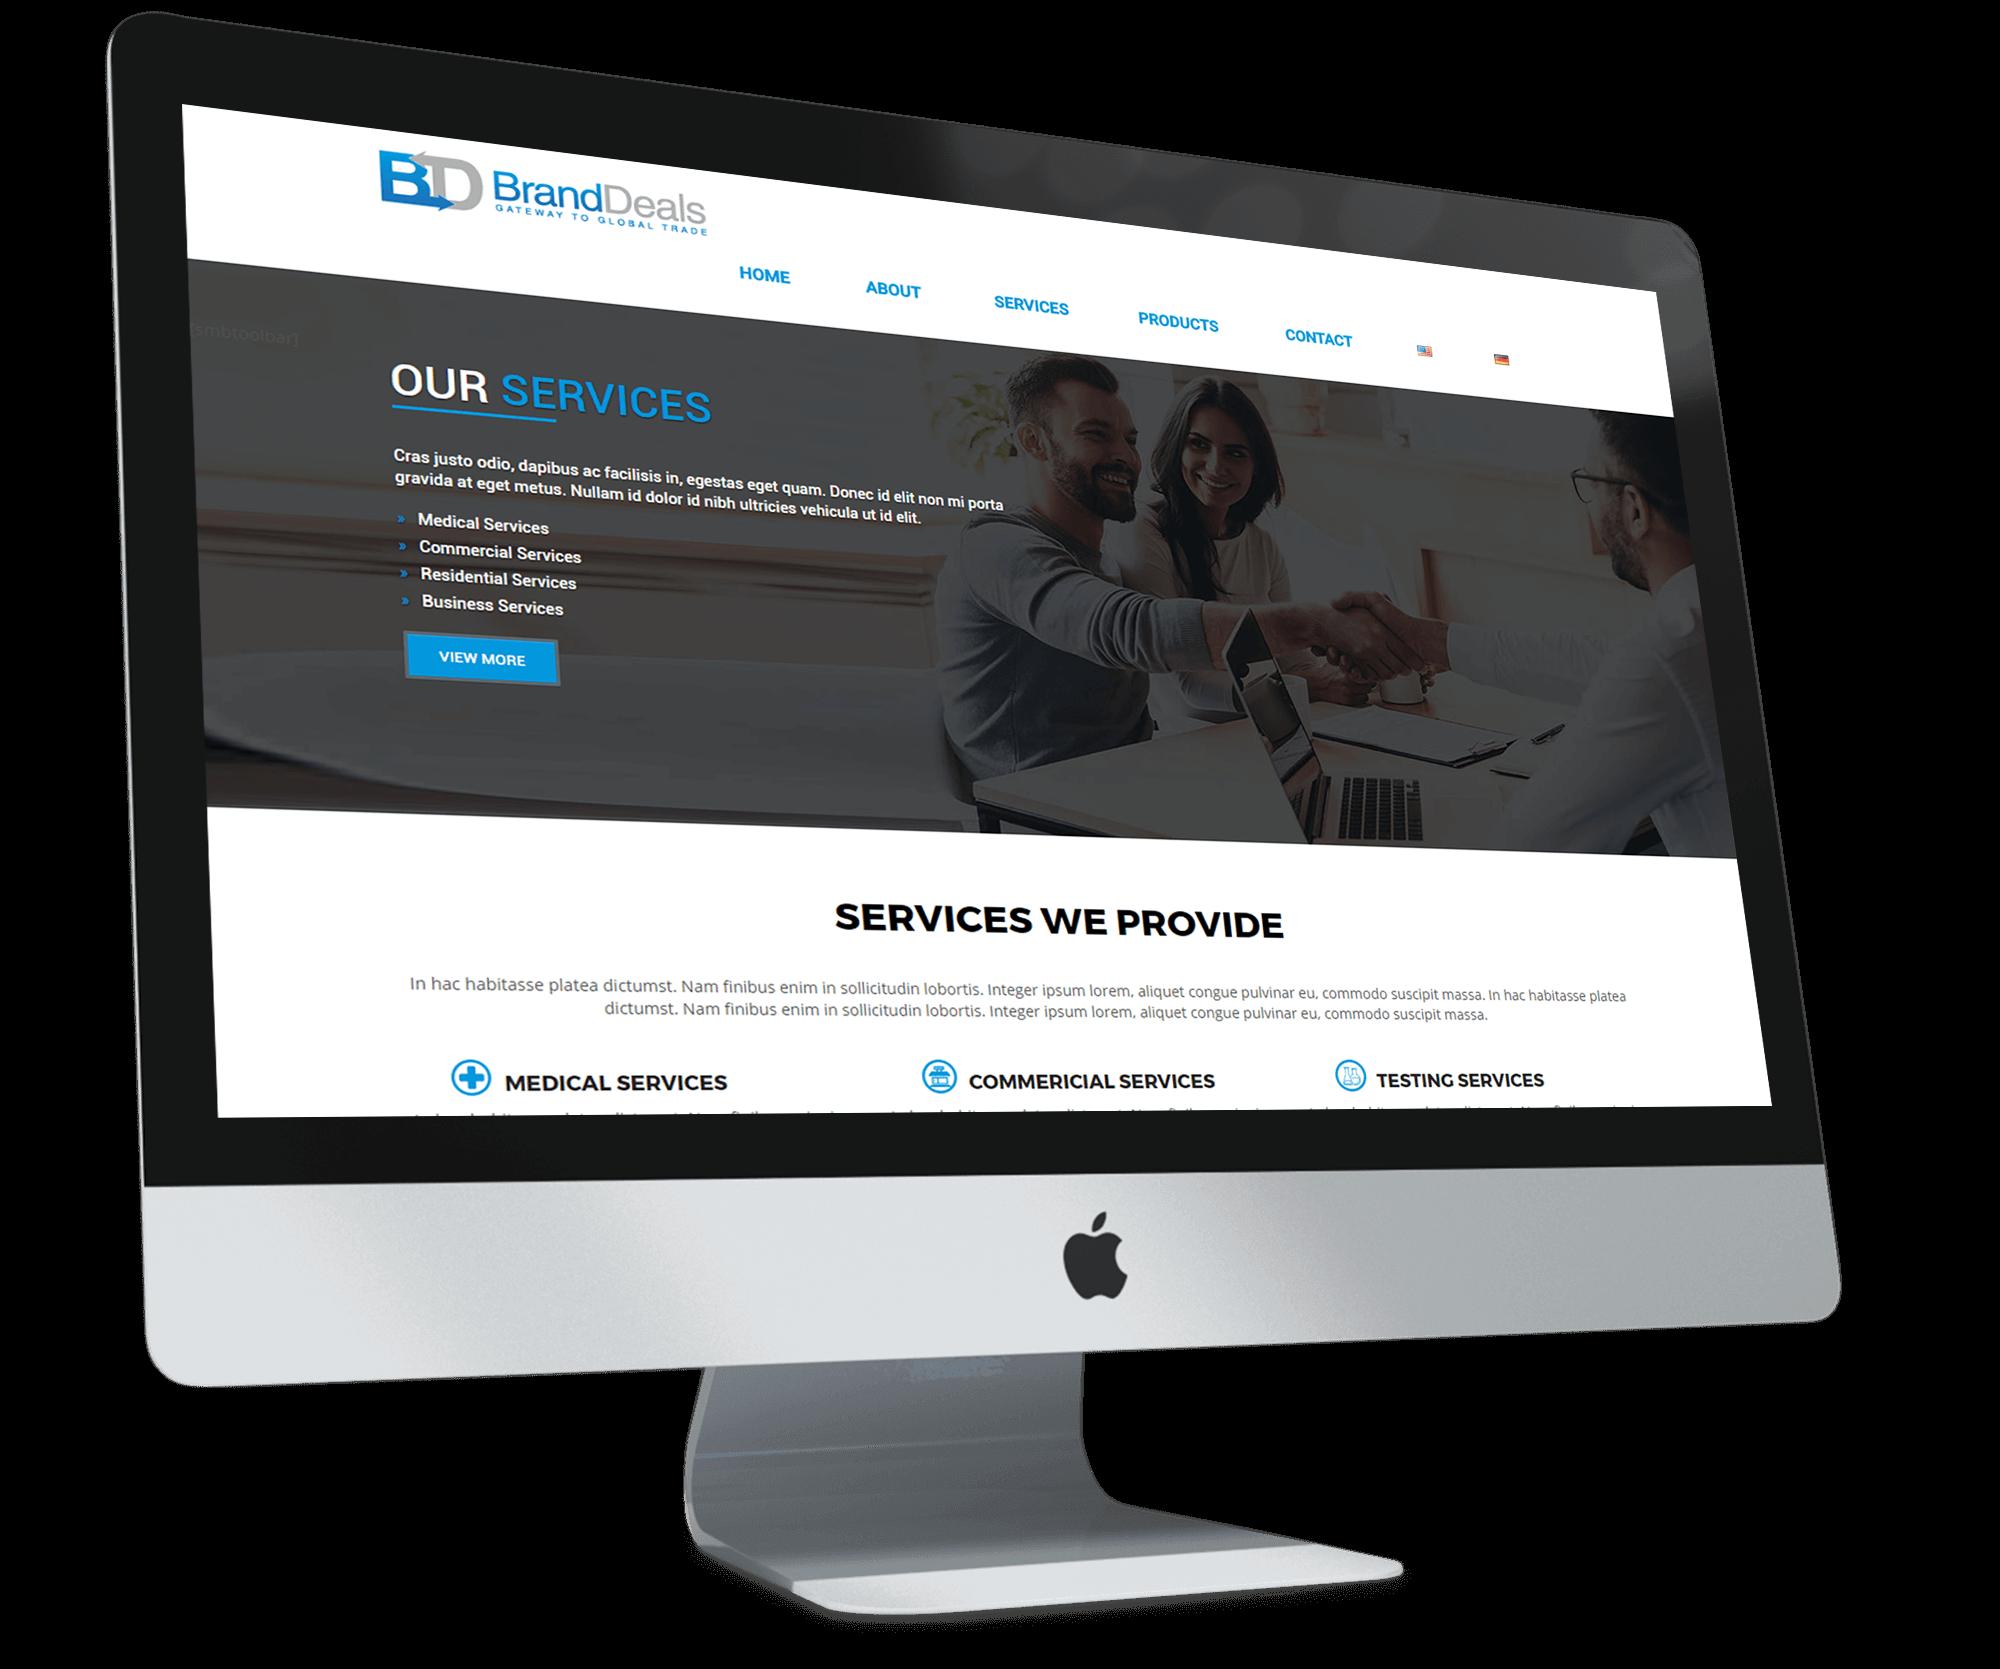 Brandcrock-BrandDeals-BrandCrock-portfolio-services-imac